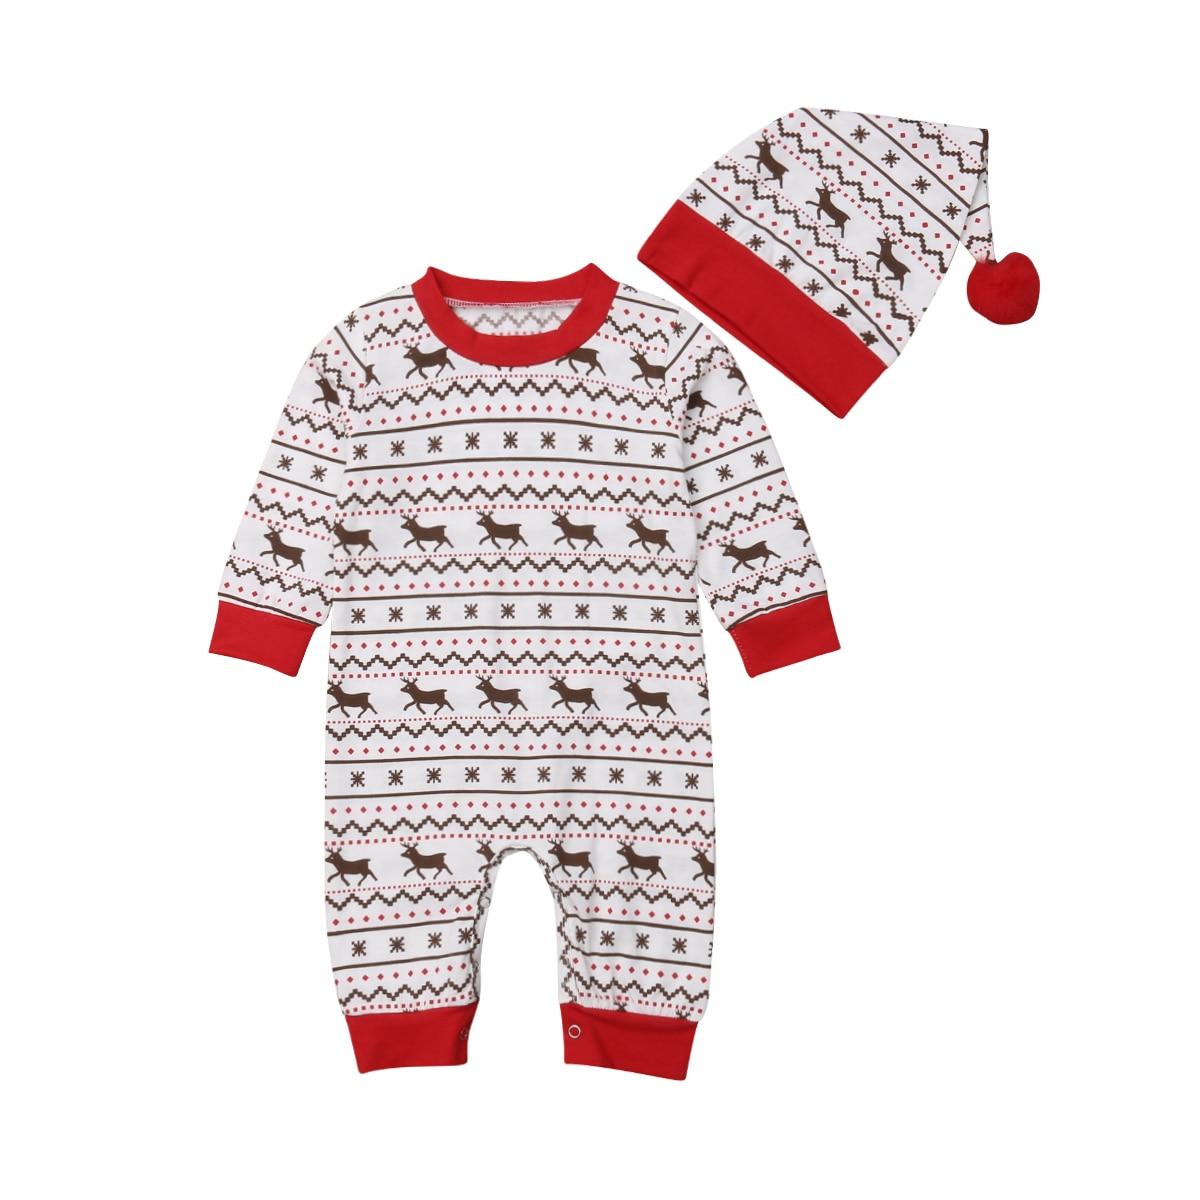 2PCS Christmas Set Unisex Newborn Baby Boys Girls Deer Snowflake Romper Jumpsuit + Hat Xmas Outfit